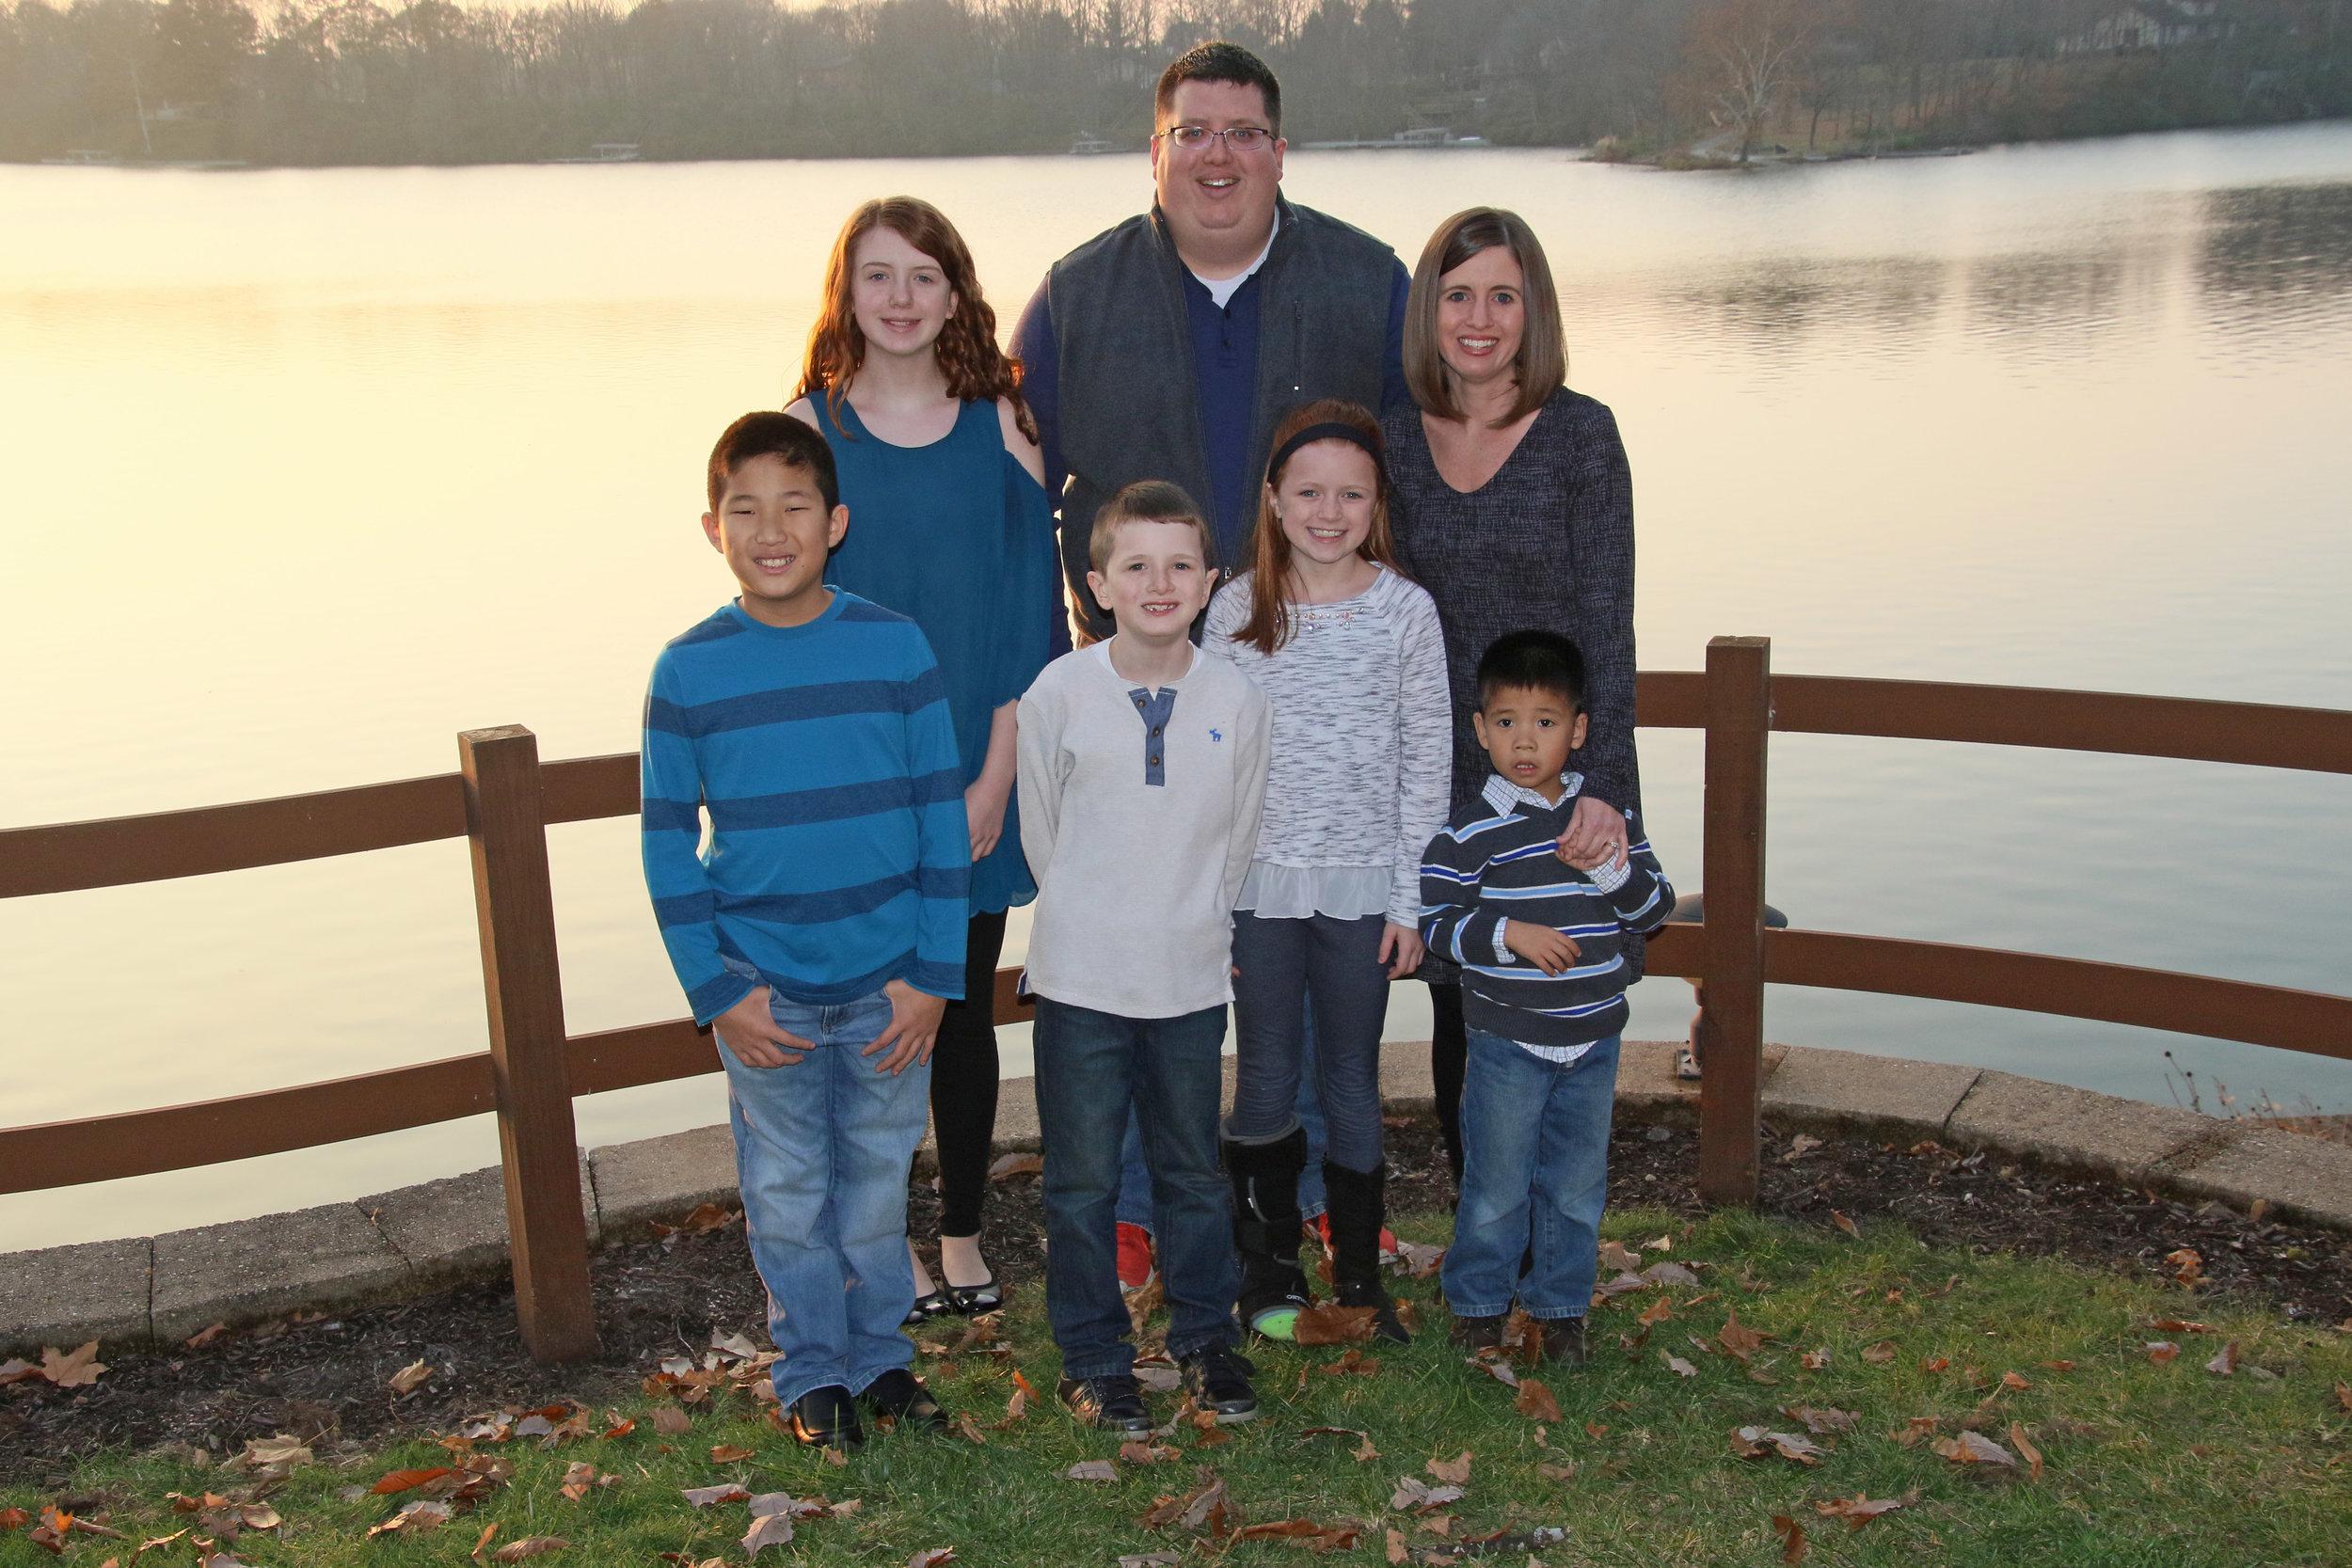 11-22-2018 Thanksgiving Family Photos (6b).jpg